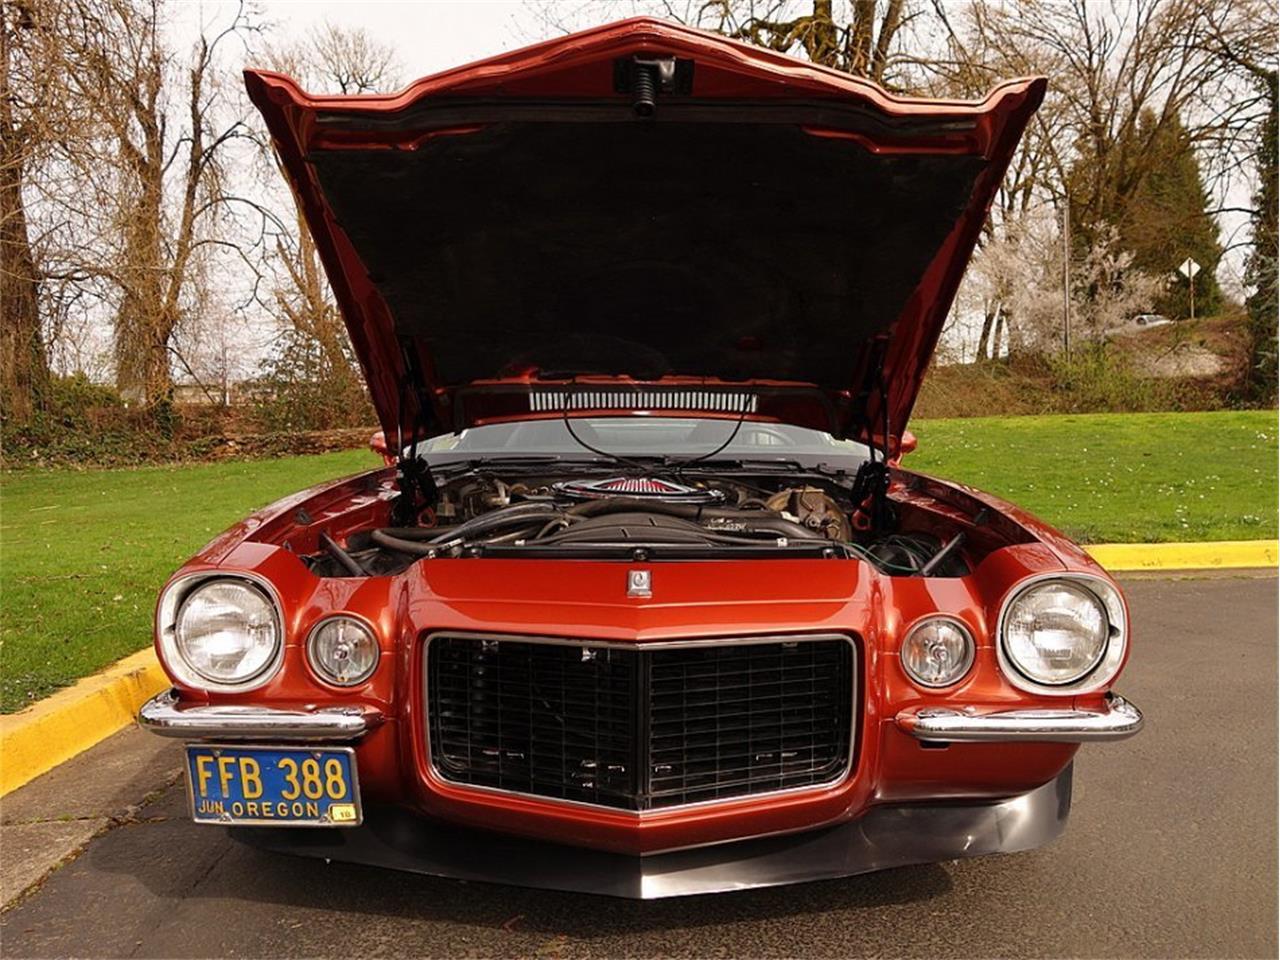 1971 Chevrolet Camaro RS (CC-1101572) for sale in Eugene, Oregon